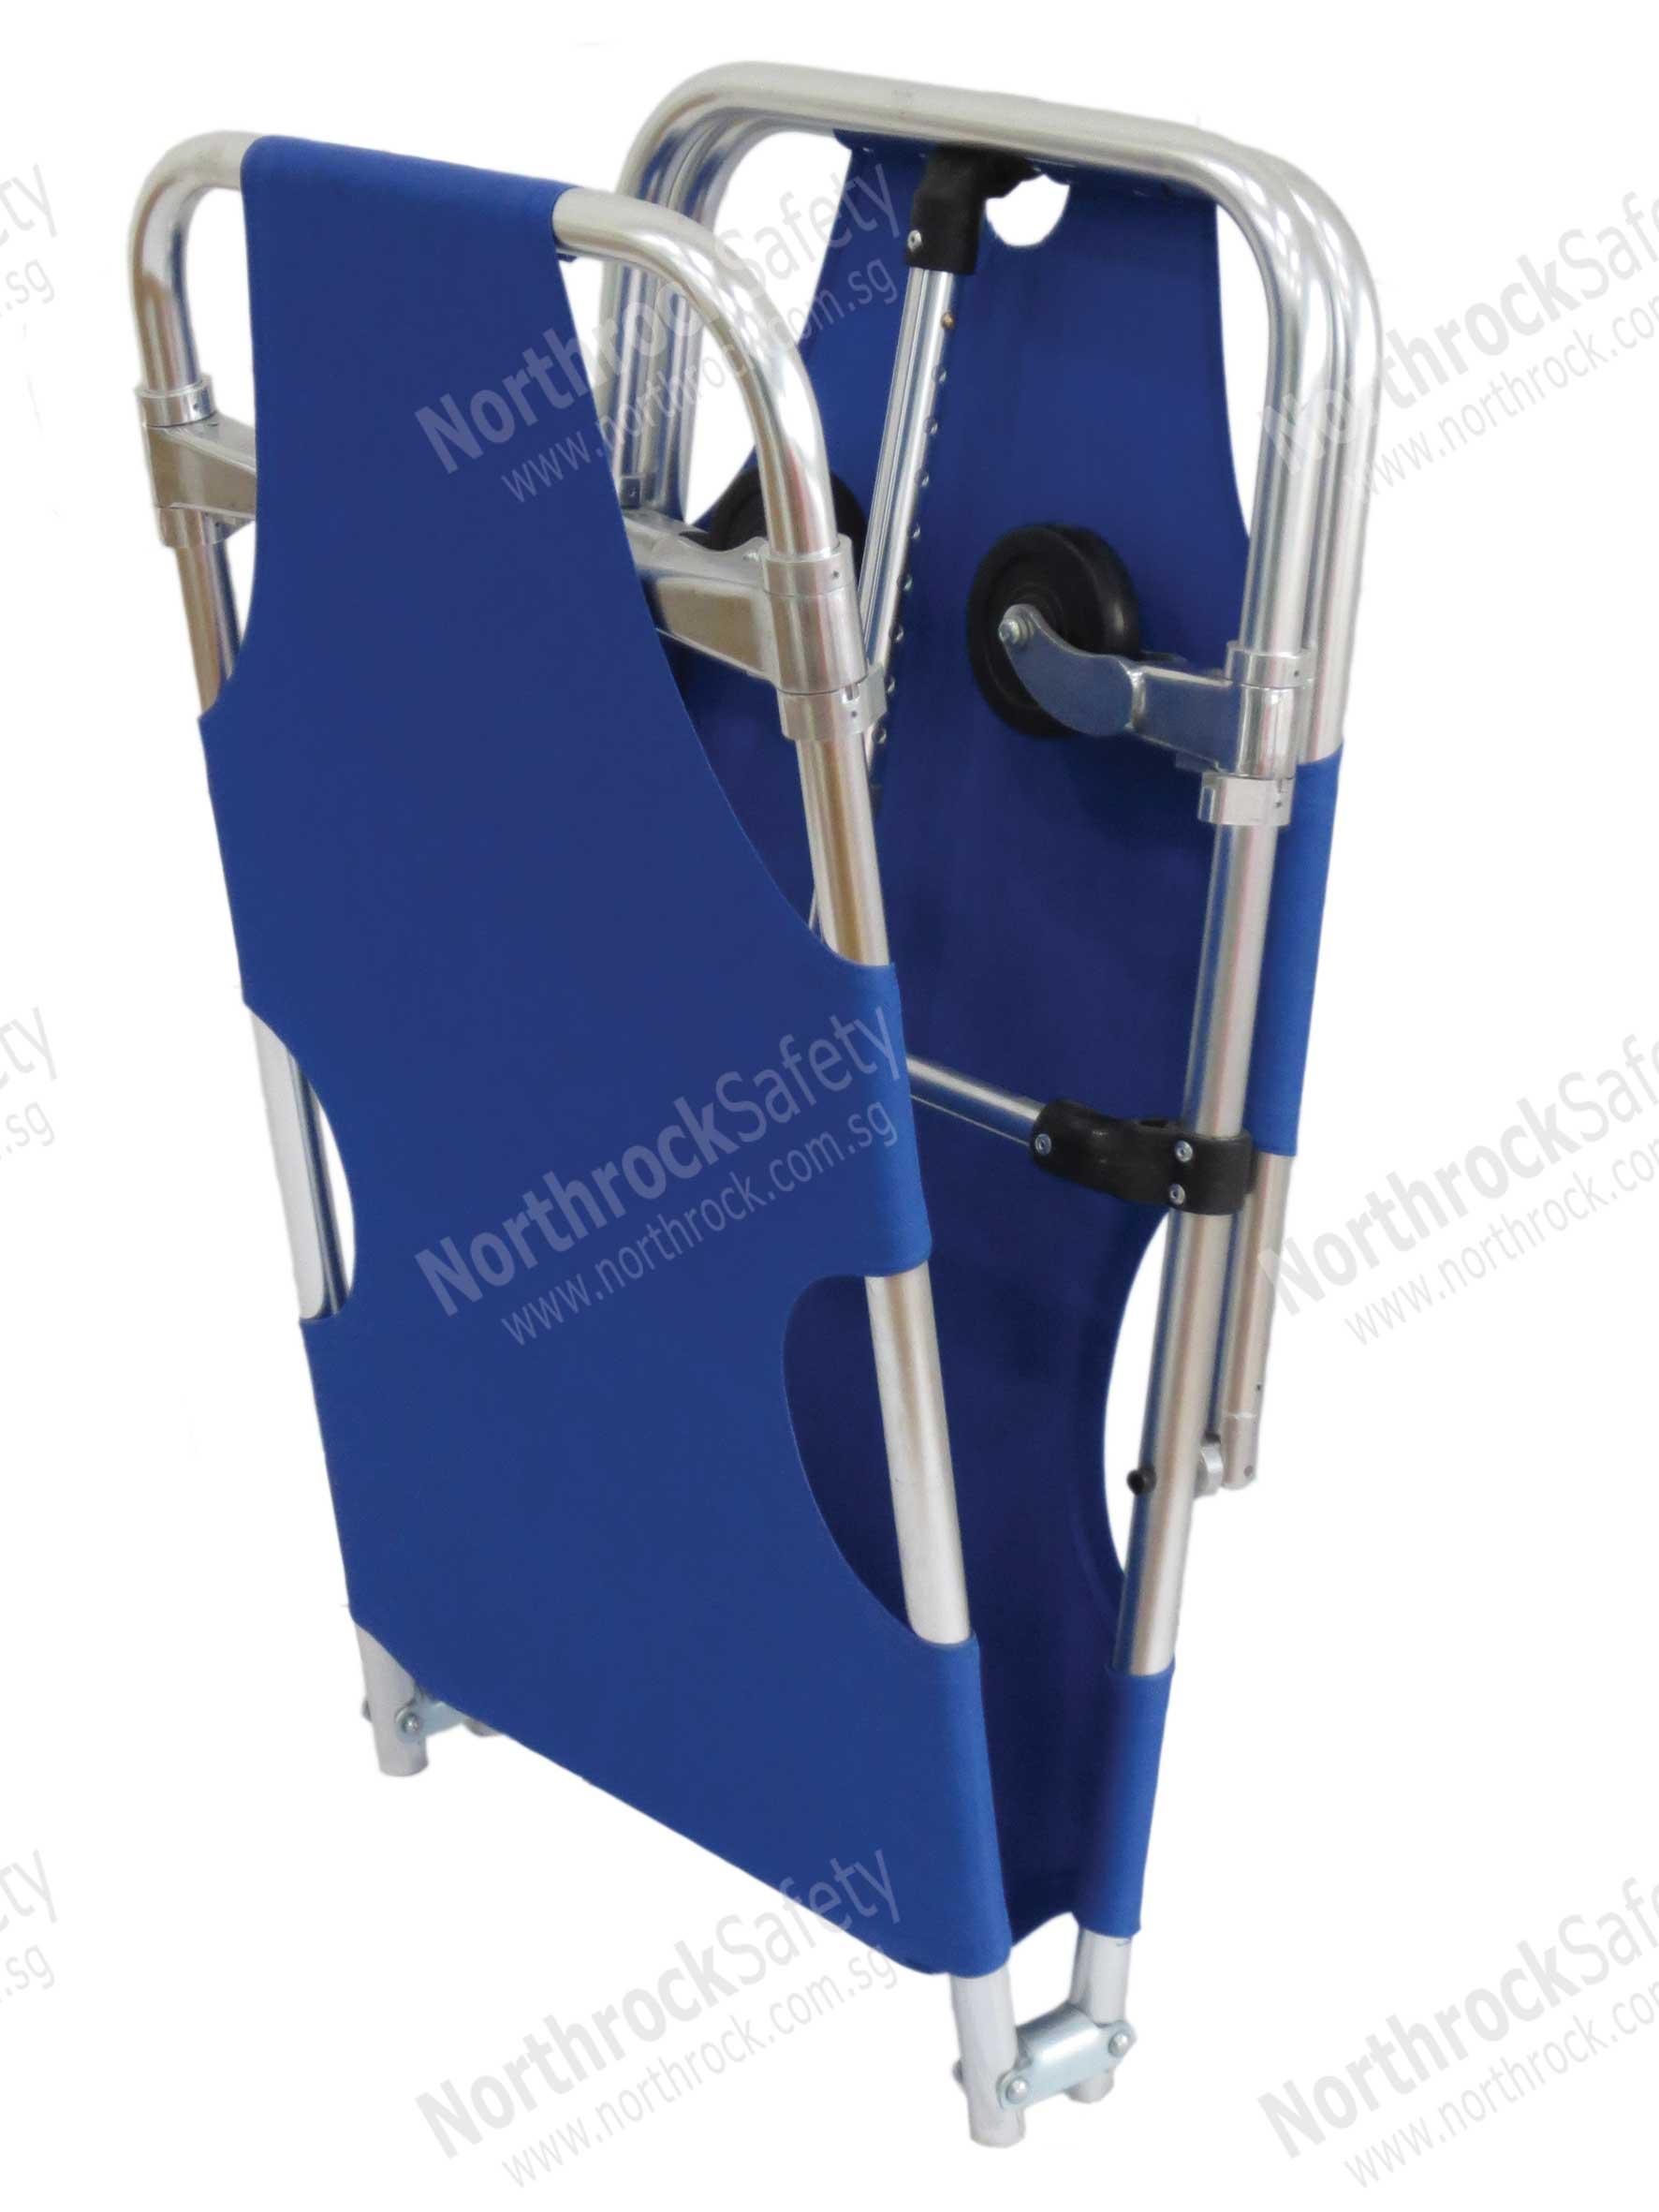 Northrock Safety Foldable Stretcher W Adjustable